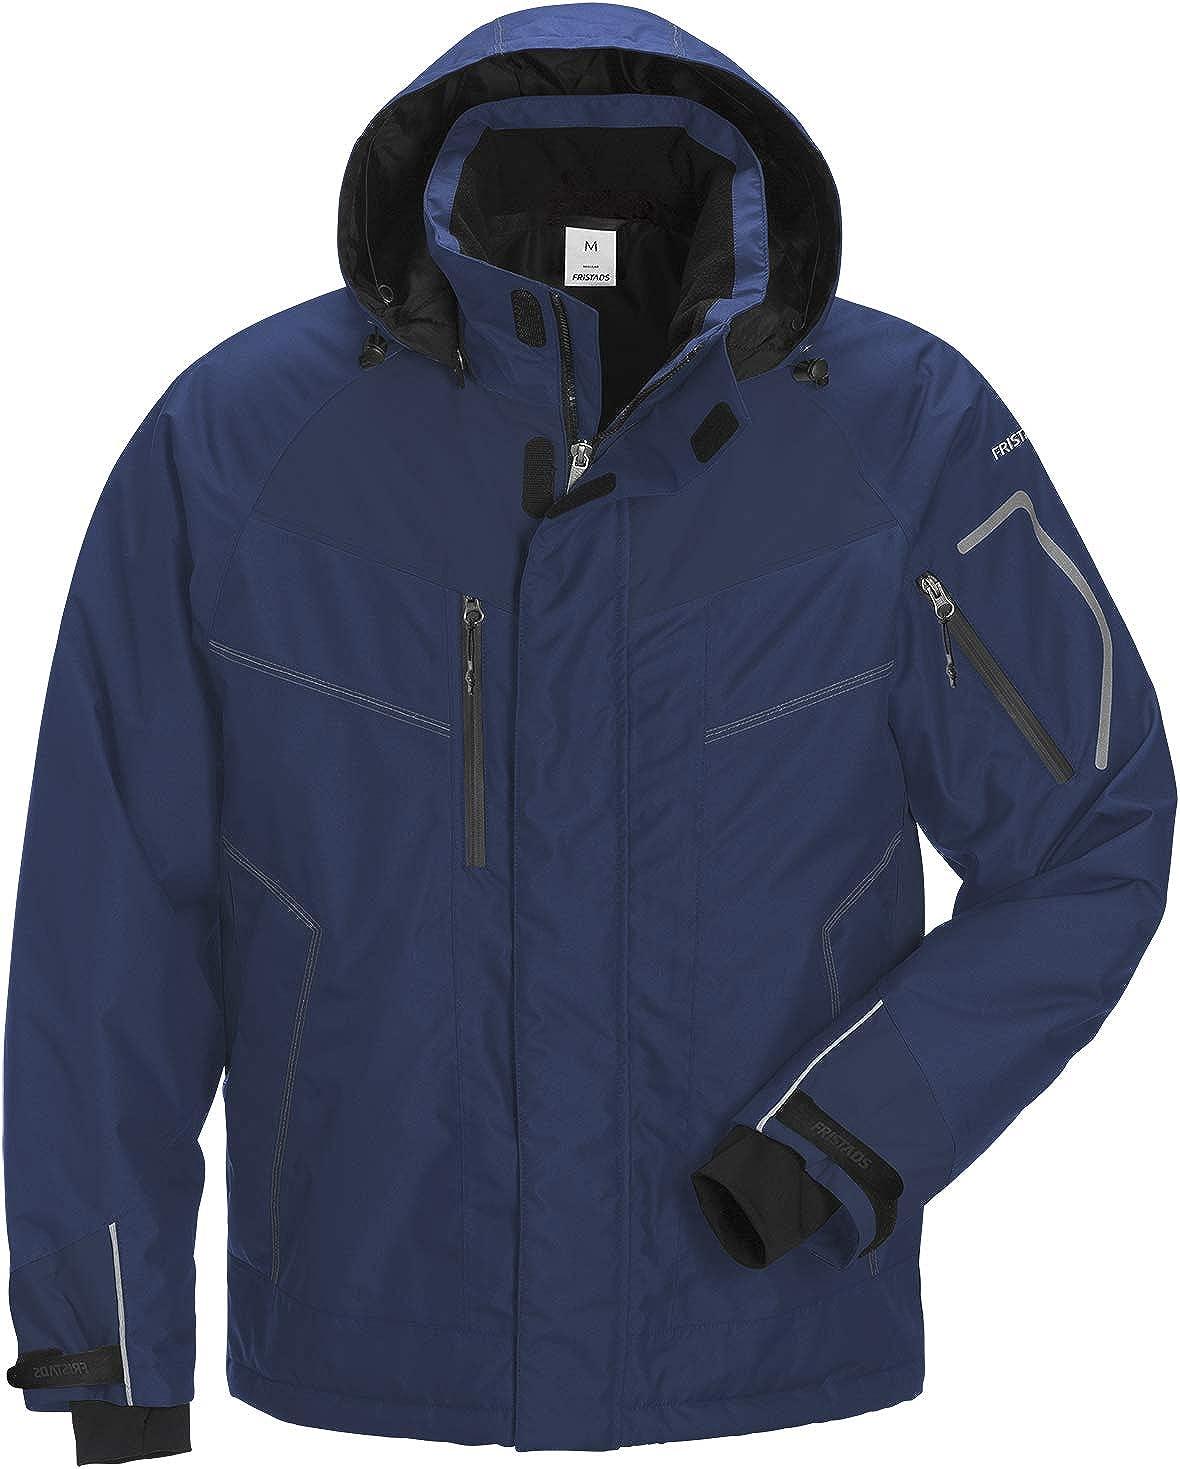 Fristads Kansas Workwear 115681 Airtech Winter Jacket Dark Navy XL